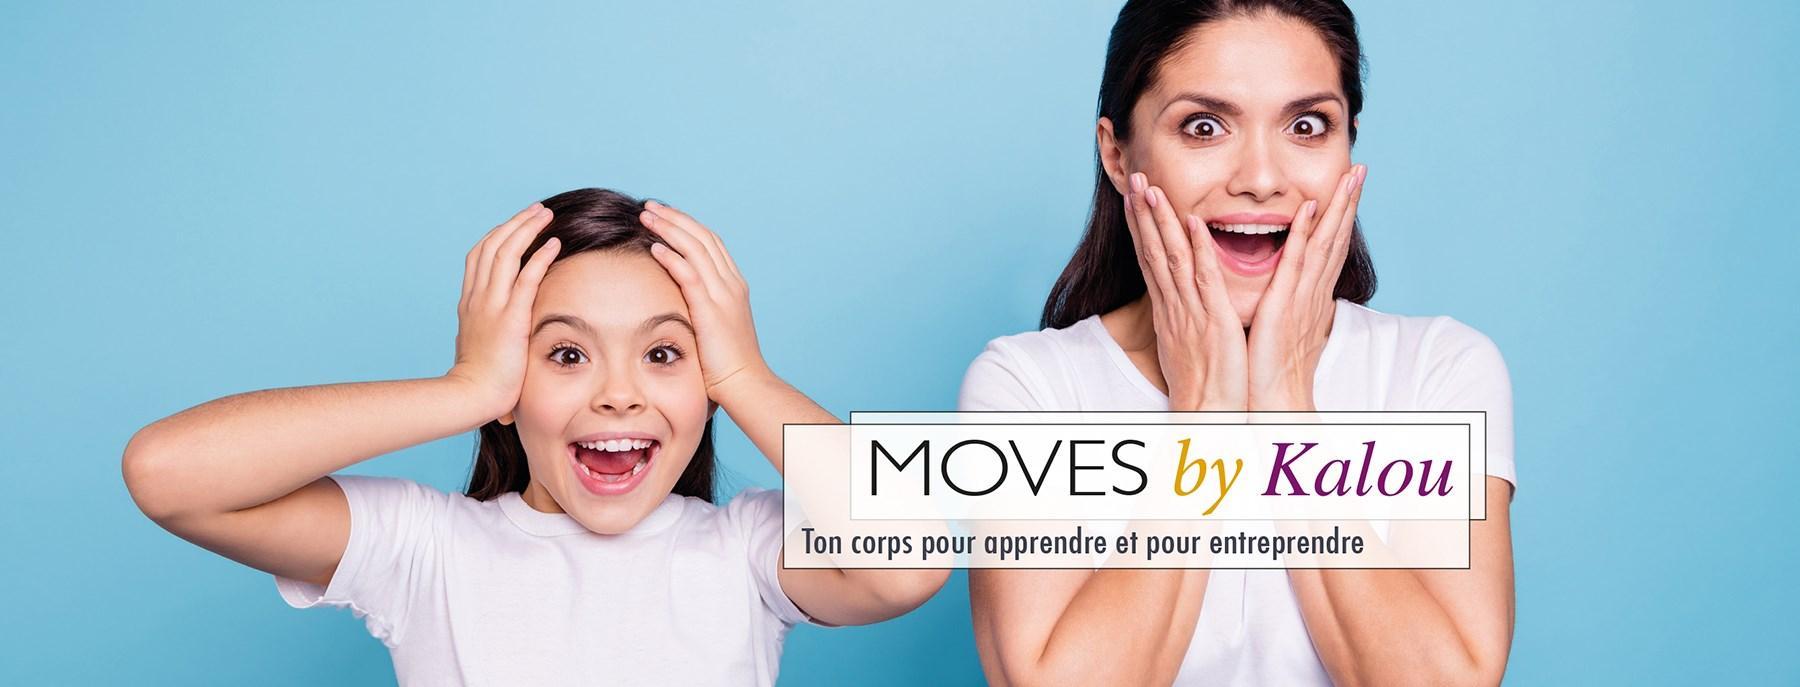 Moves logo 1